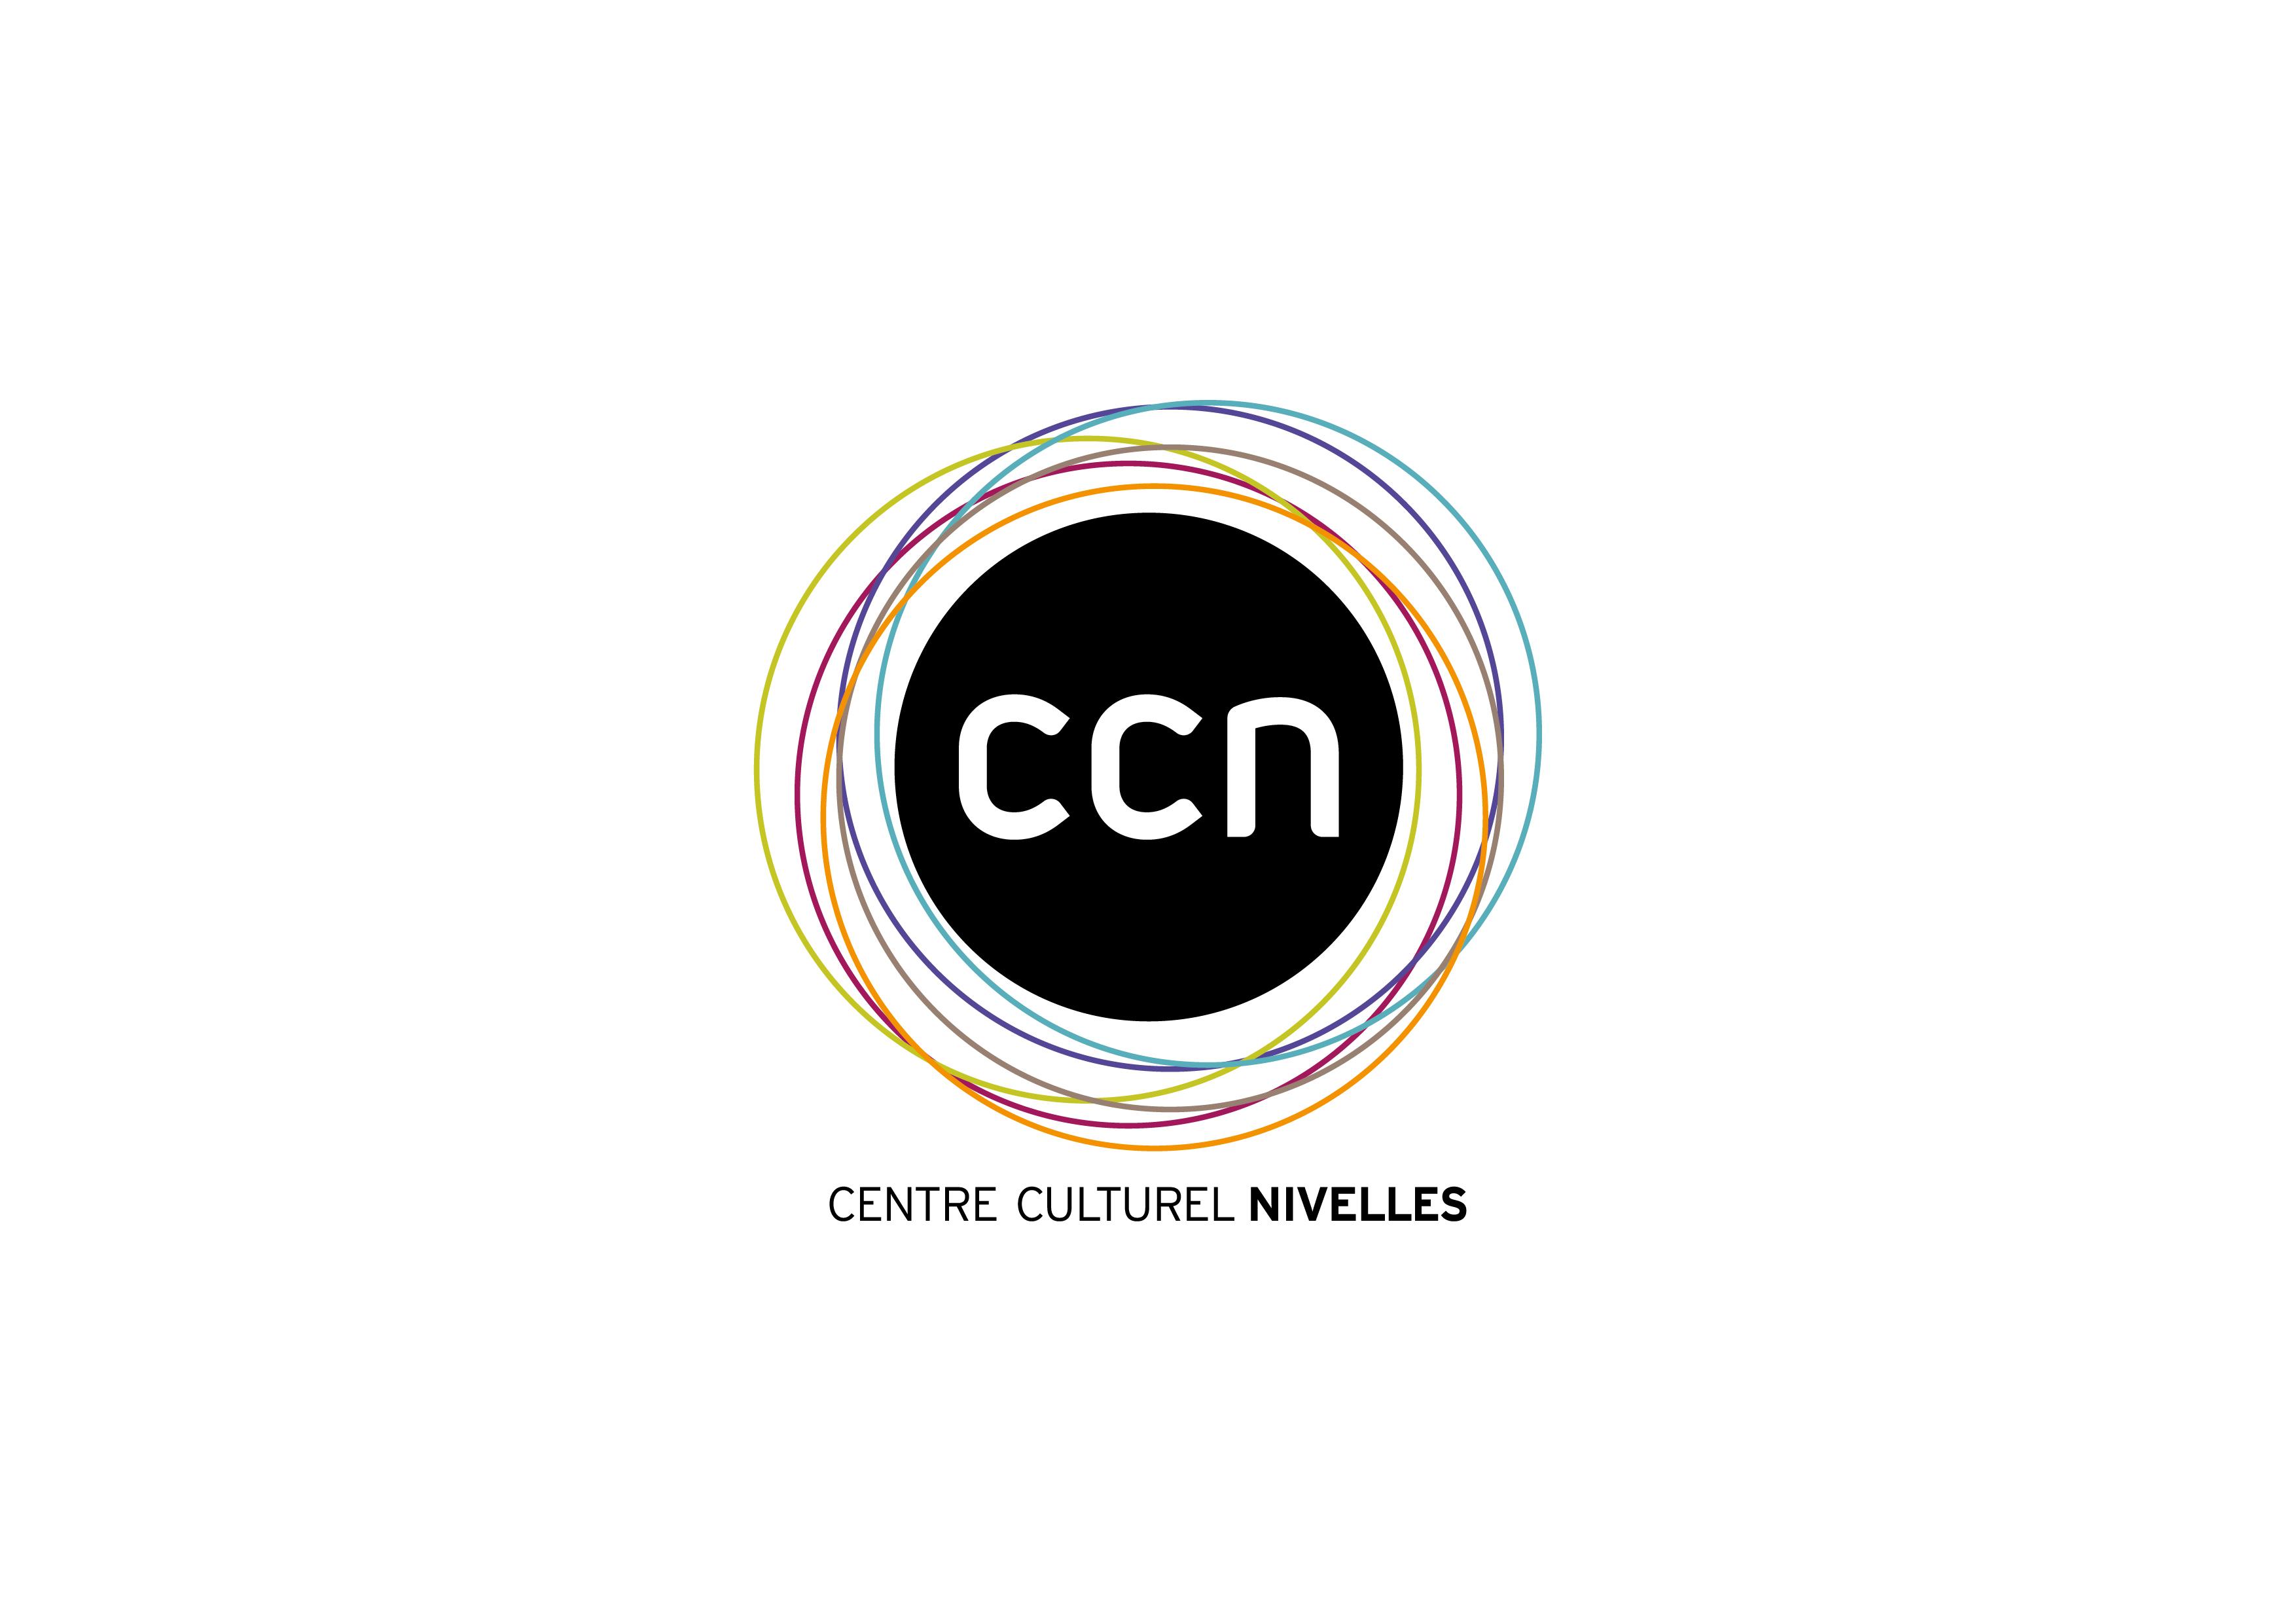 centrecultureldenivelles.be